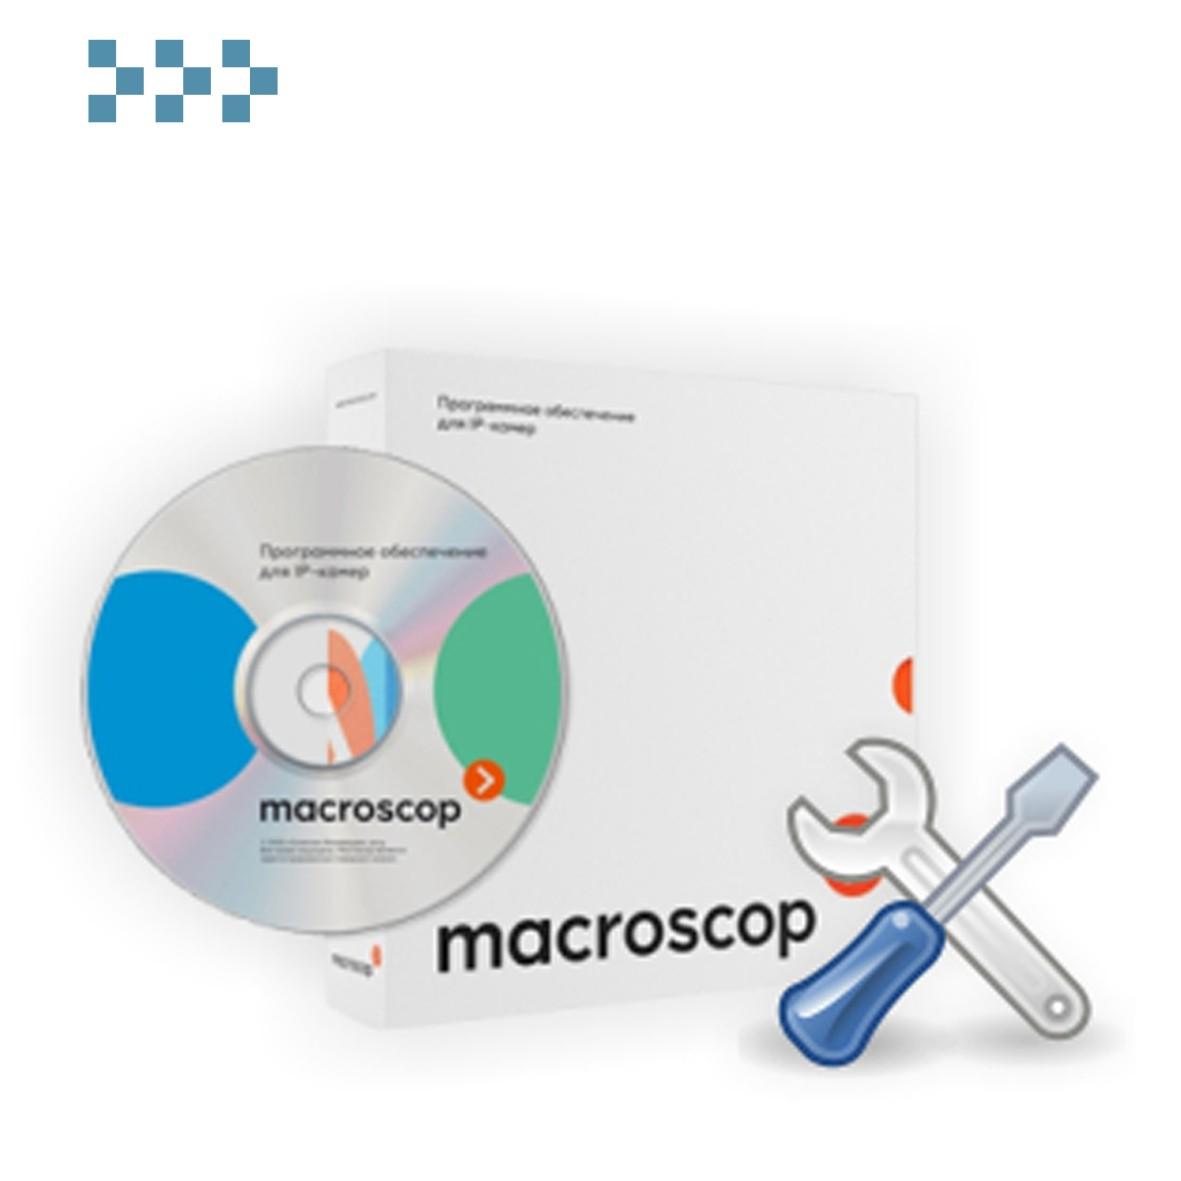 Версия ПО Macroscop 2.3